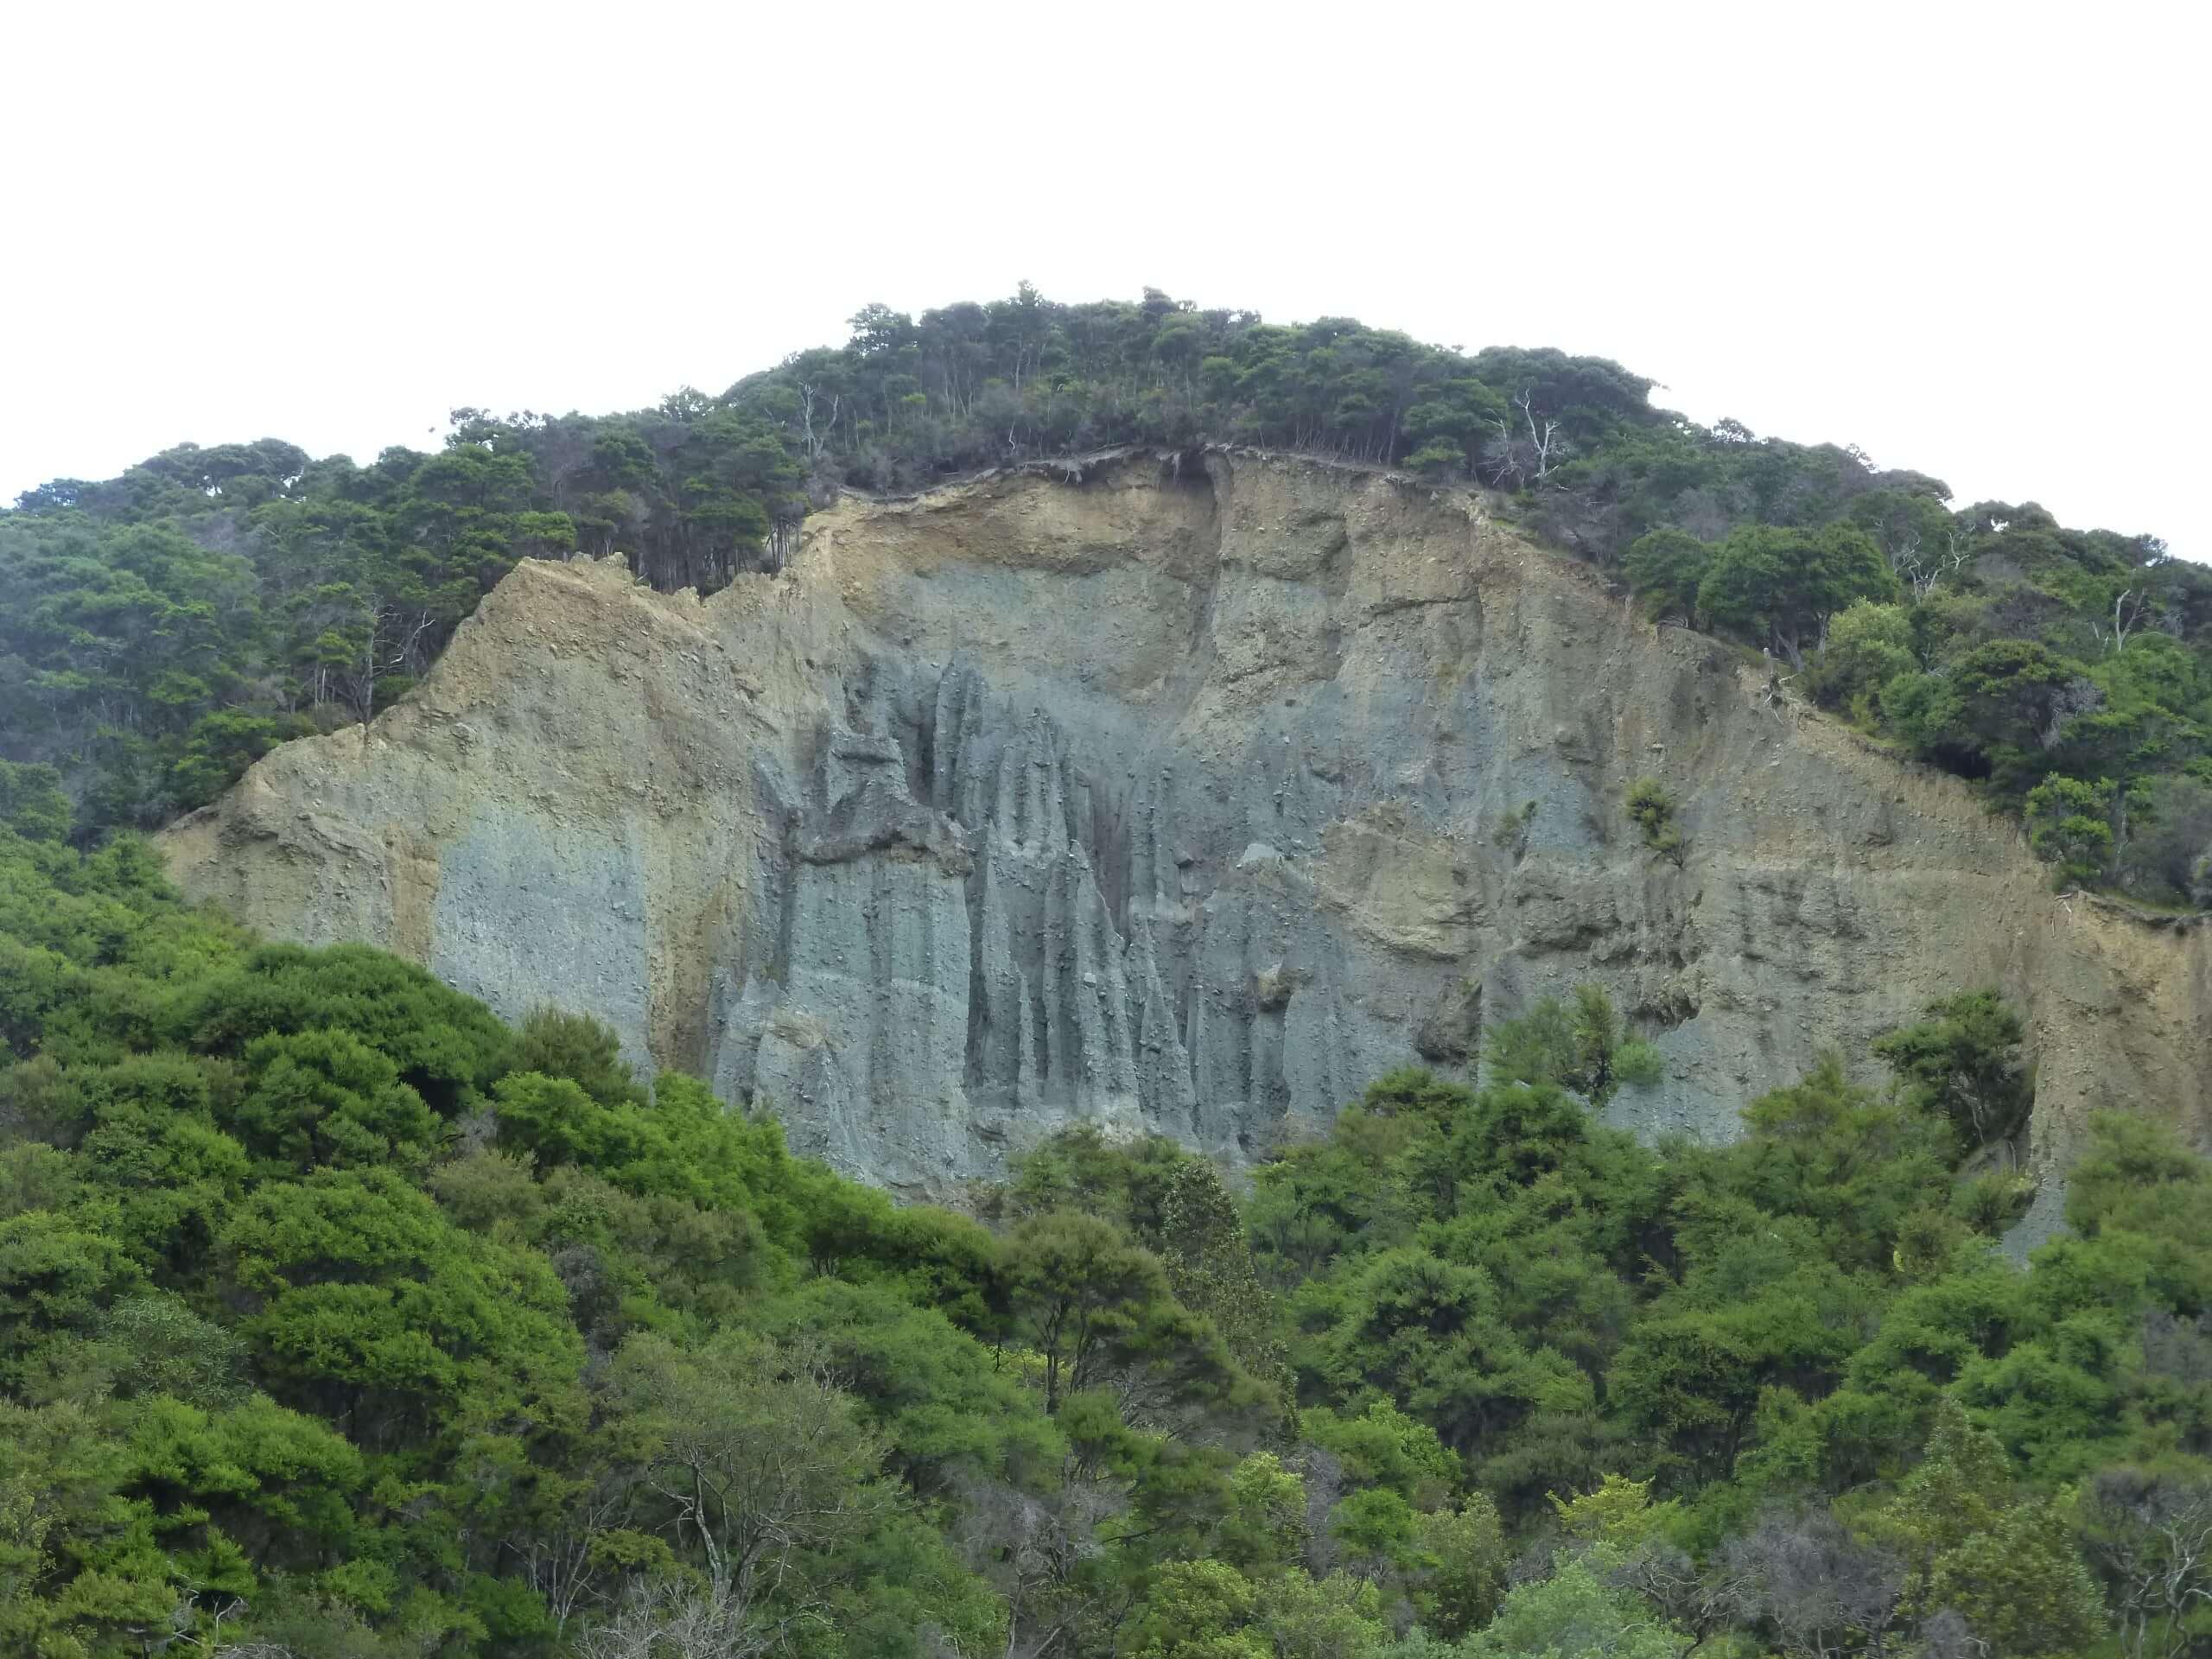 Putangirua Pinnacles 4, Weit-weg.reisen